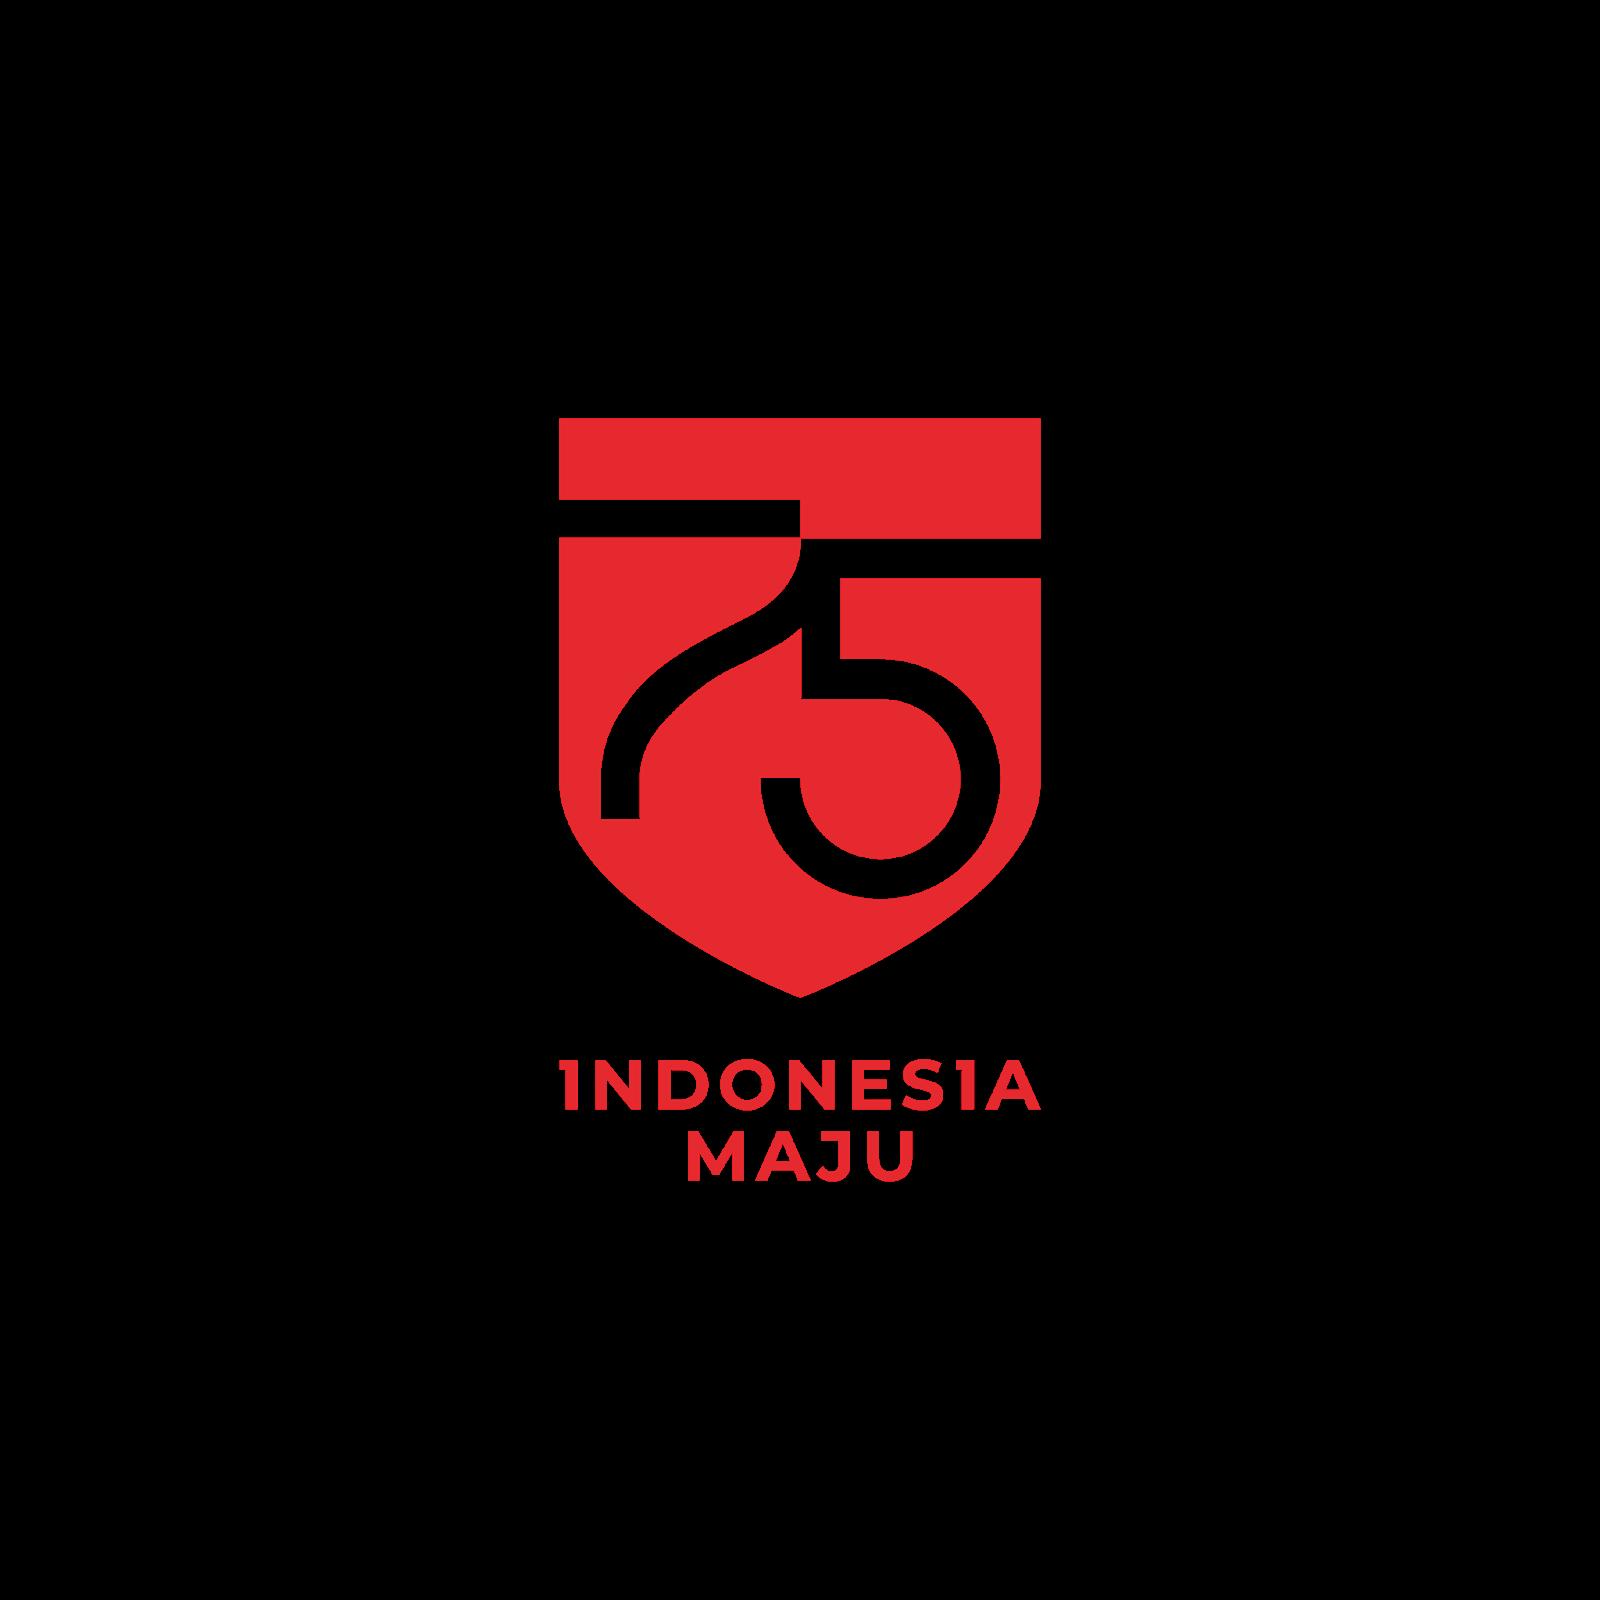 Dirgahayu Kemerdekaan Indonesia 75 Tahun